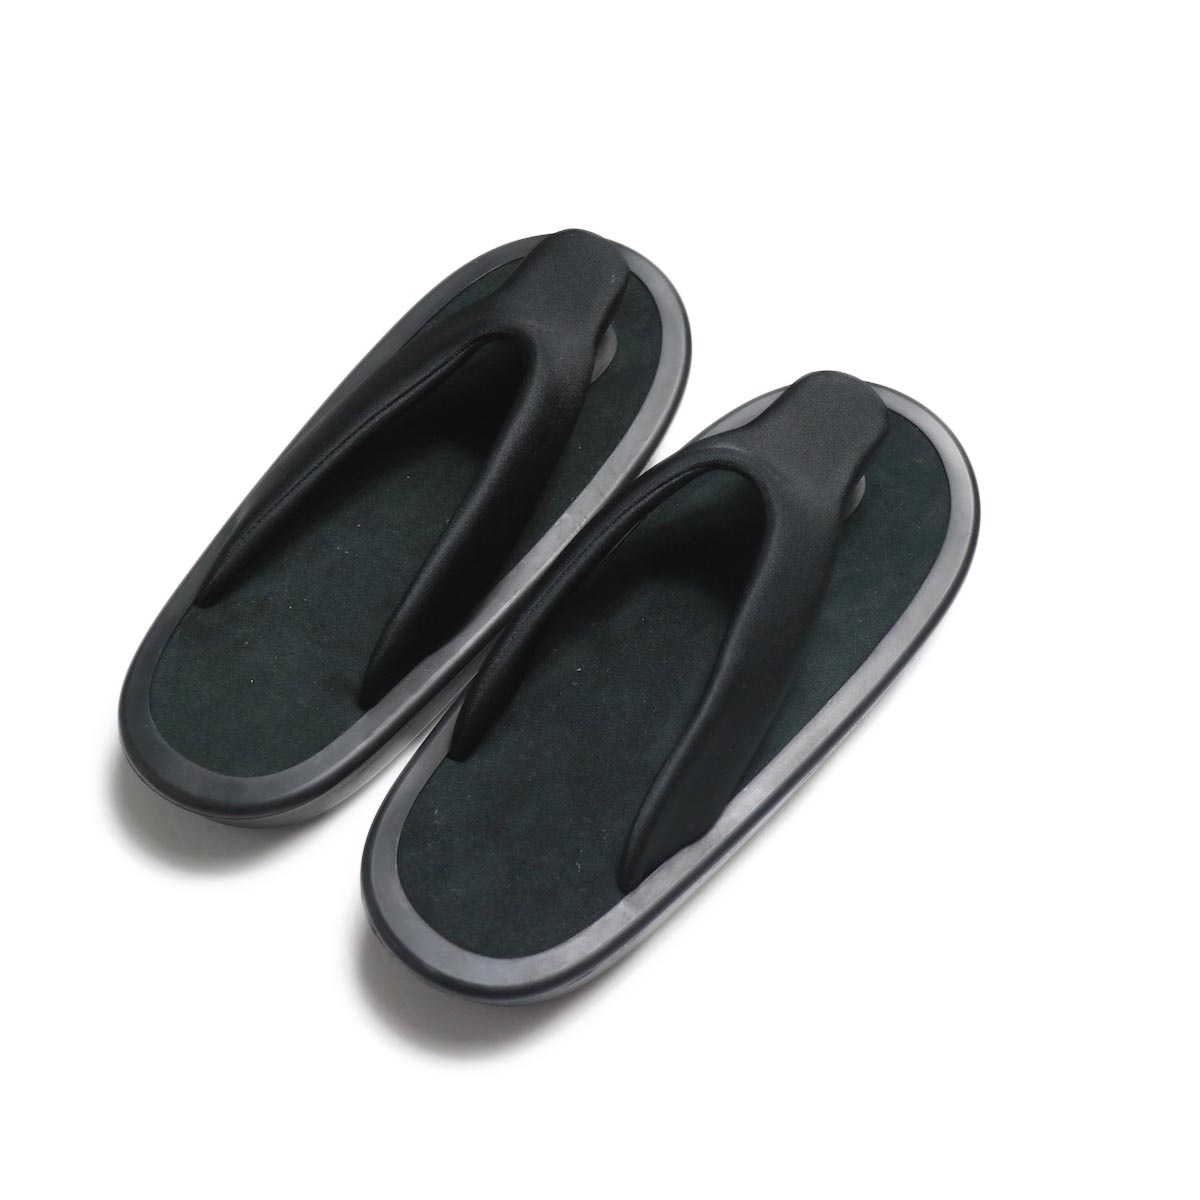 JOJO / SANDAL -Black (Black Suede) 背面